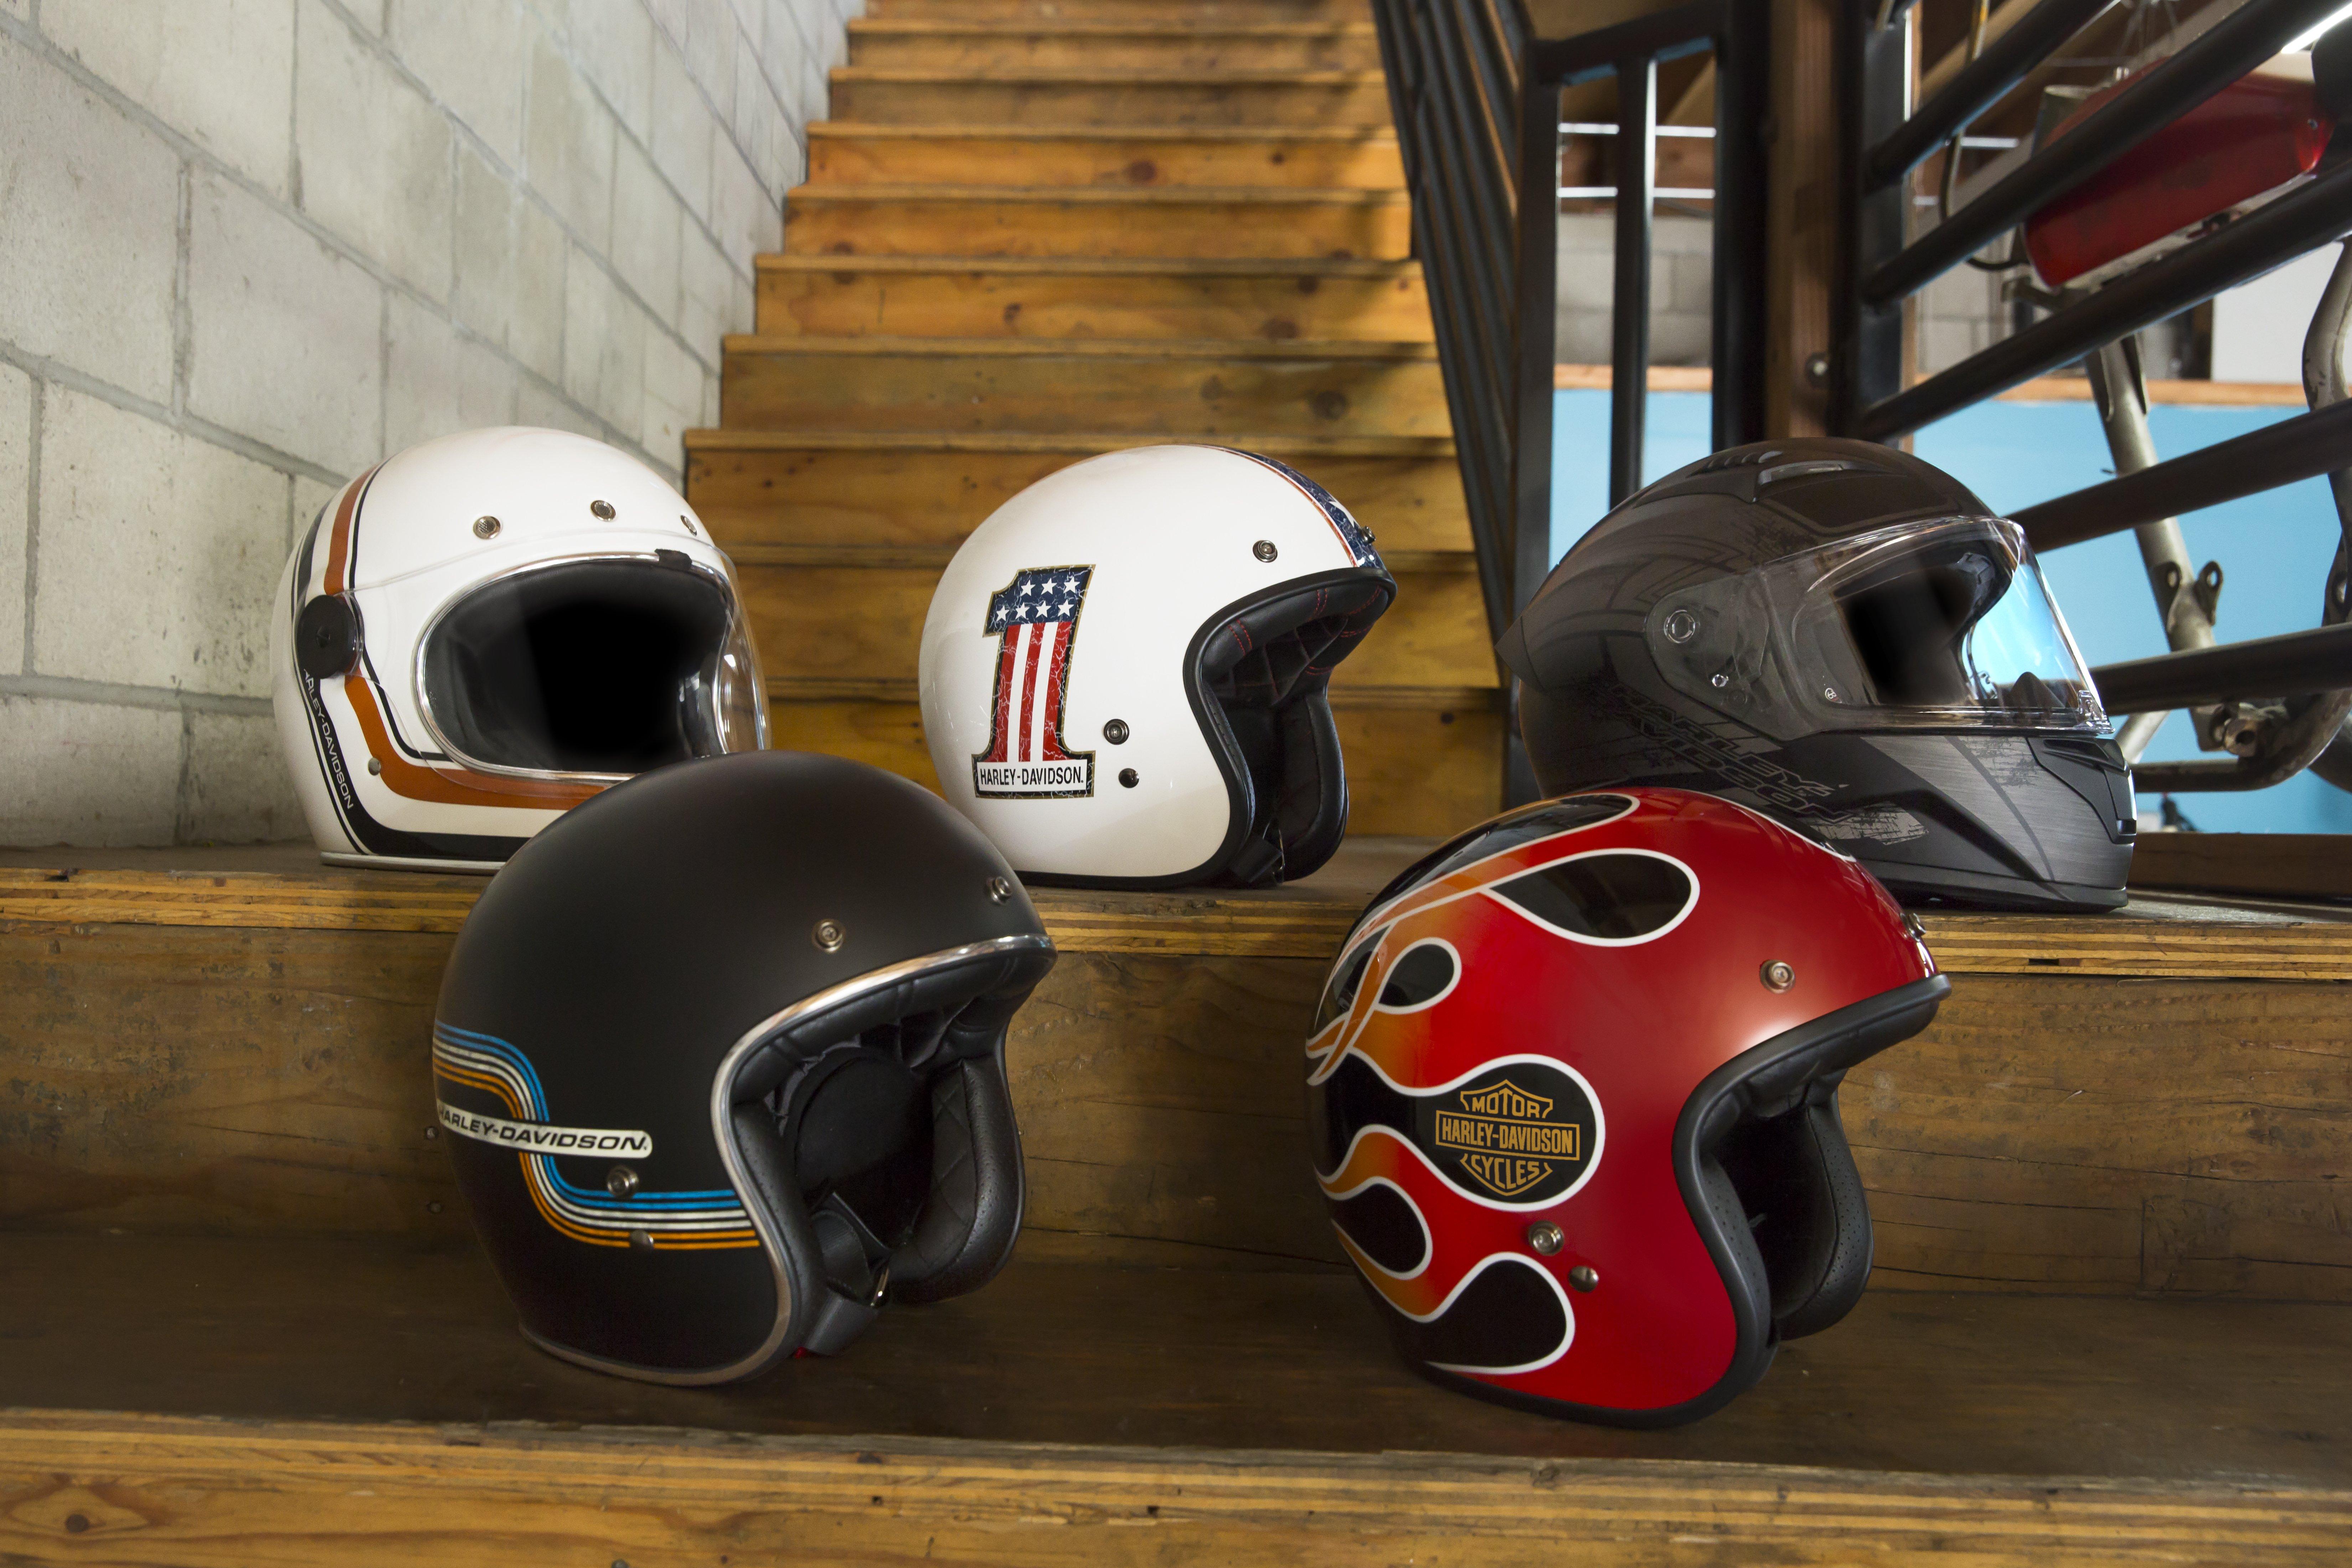 Harley-Davidson Helmet Safety Tips